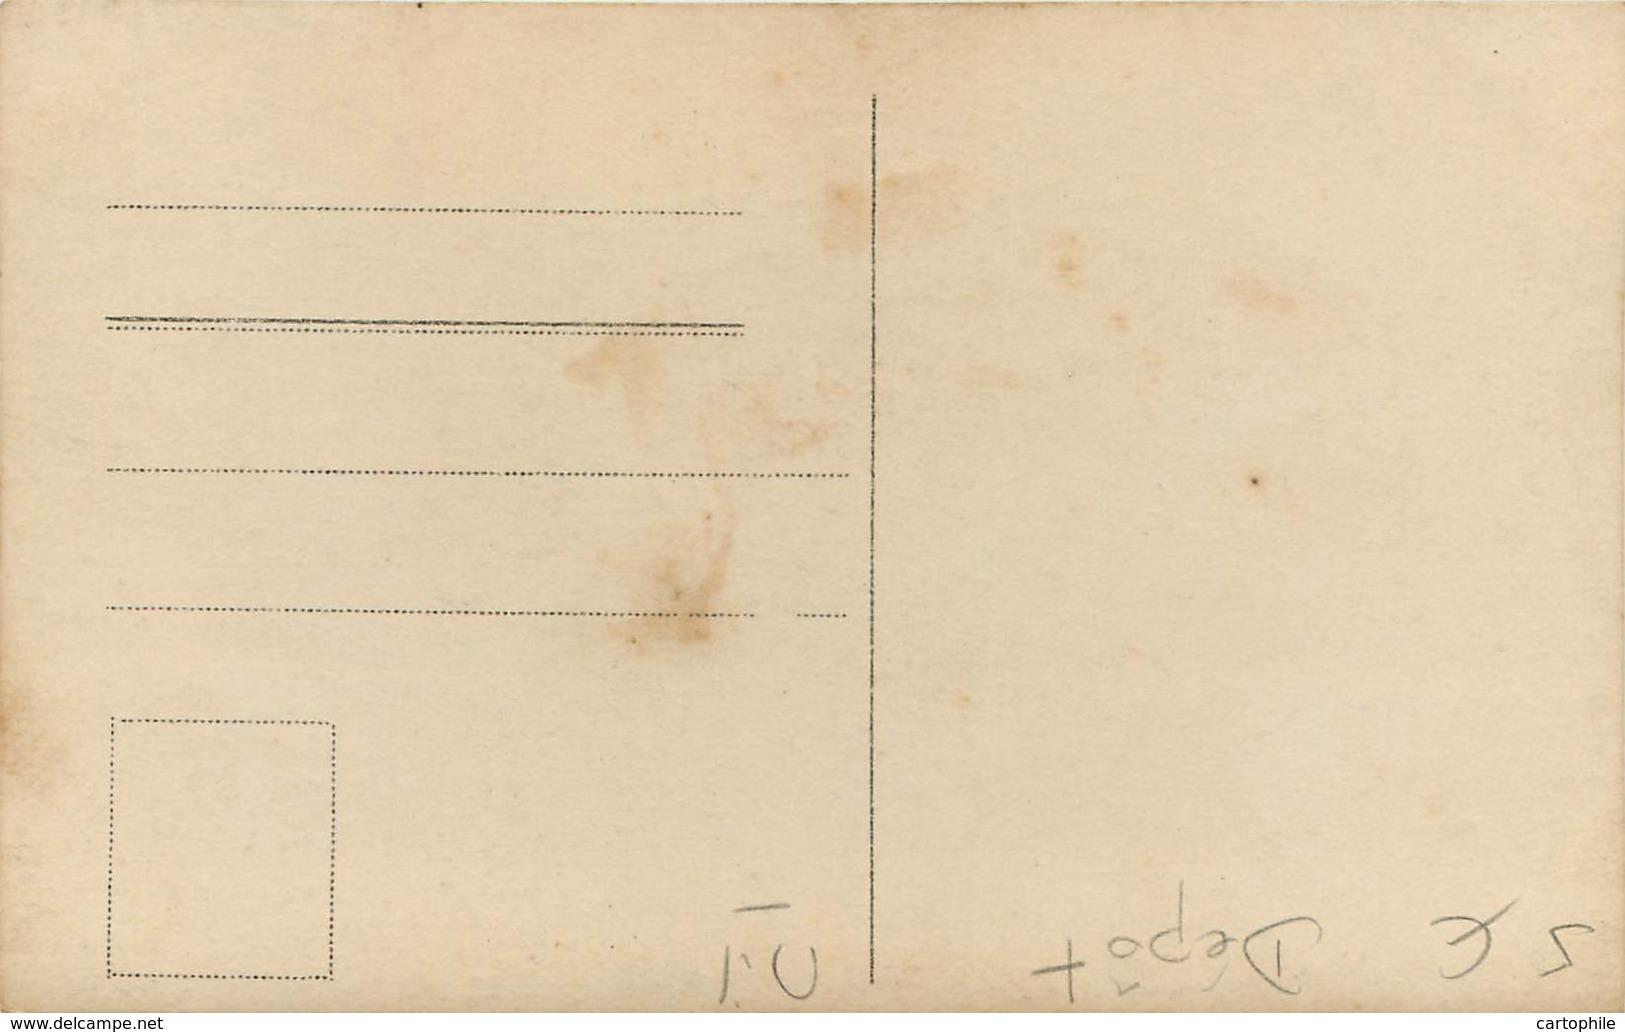 MILITARIA - Carte Photo De Soldats Et Officiers Allemands - Indication Manuscrite : Abbaye 24/7/1916 - Guerre 1914-18